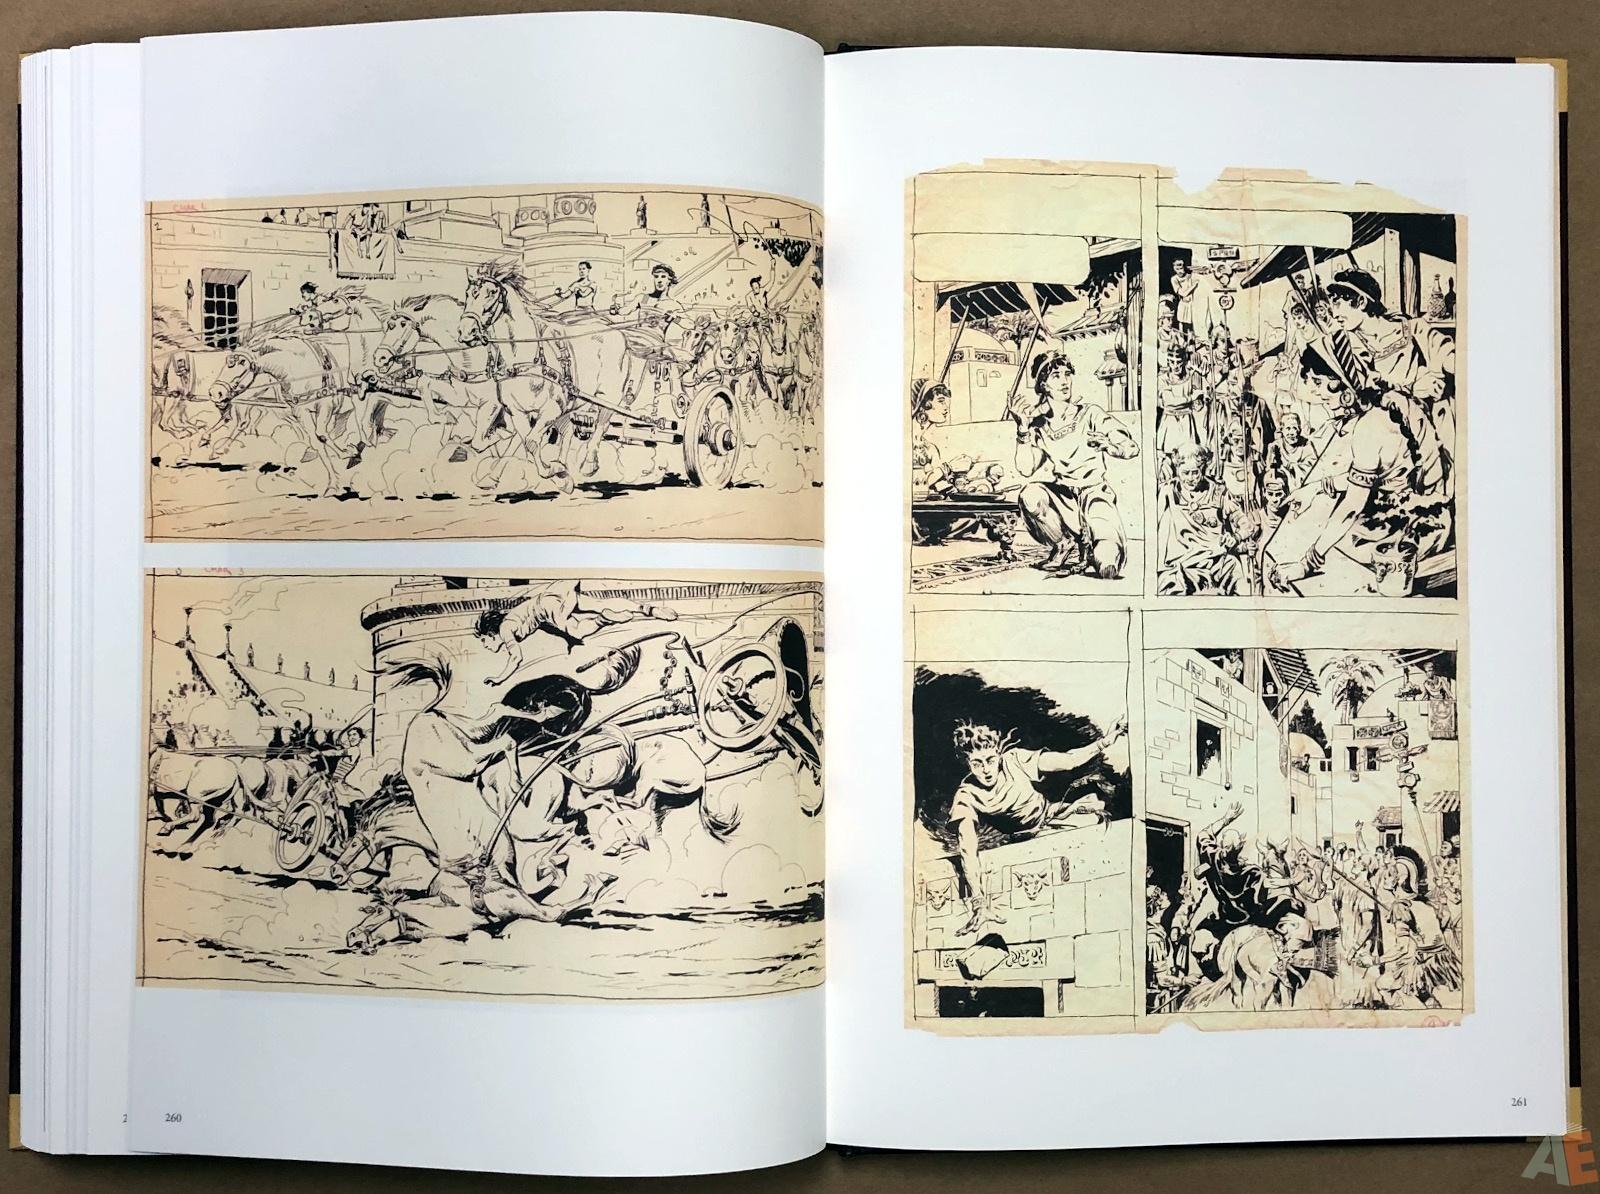 Roy G. Krenkel: Father of Heroic Fantasy - A Centennial Celebration 49